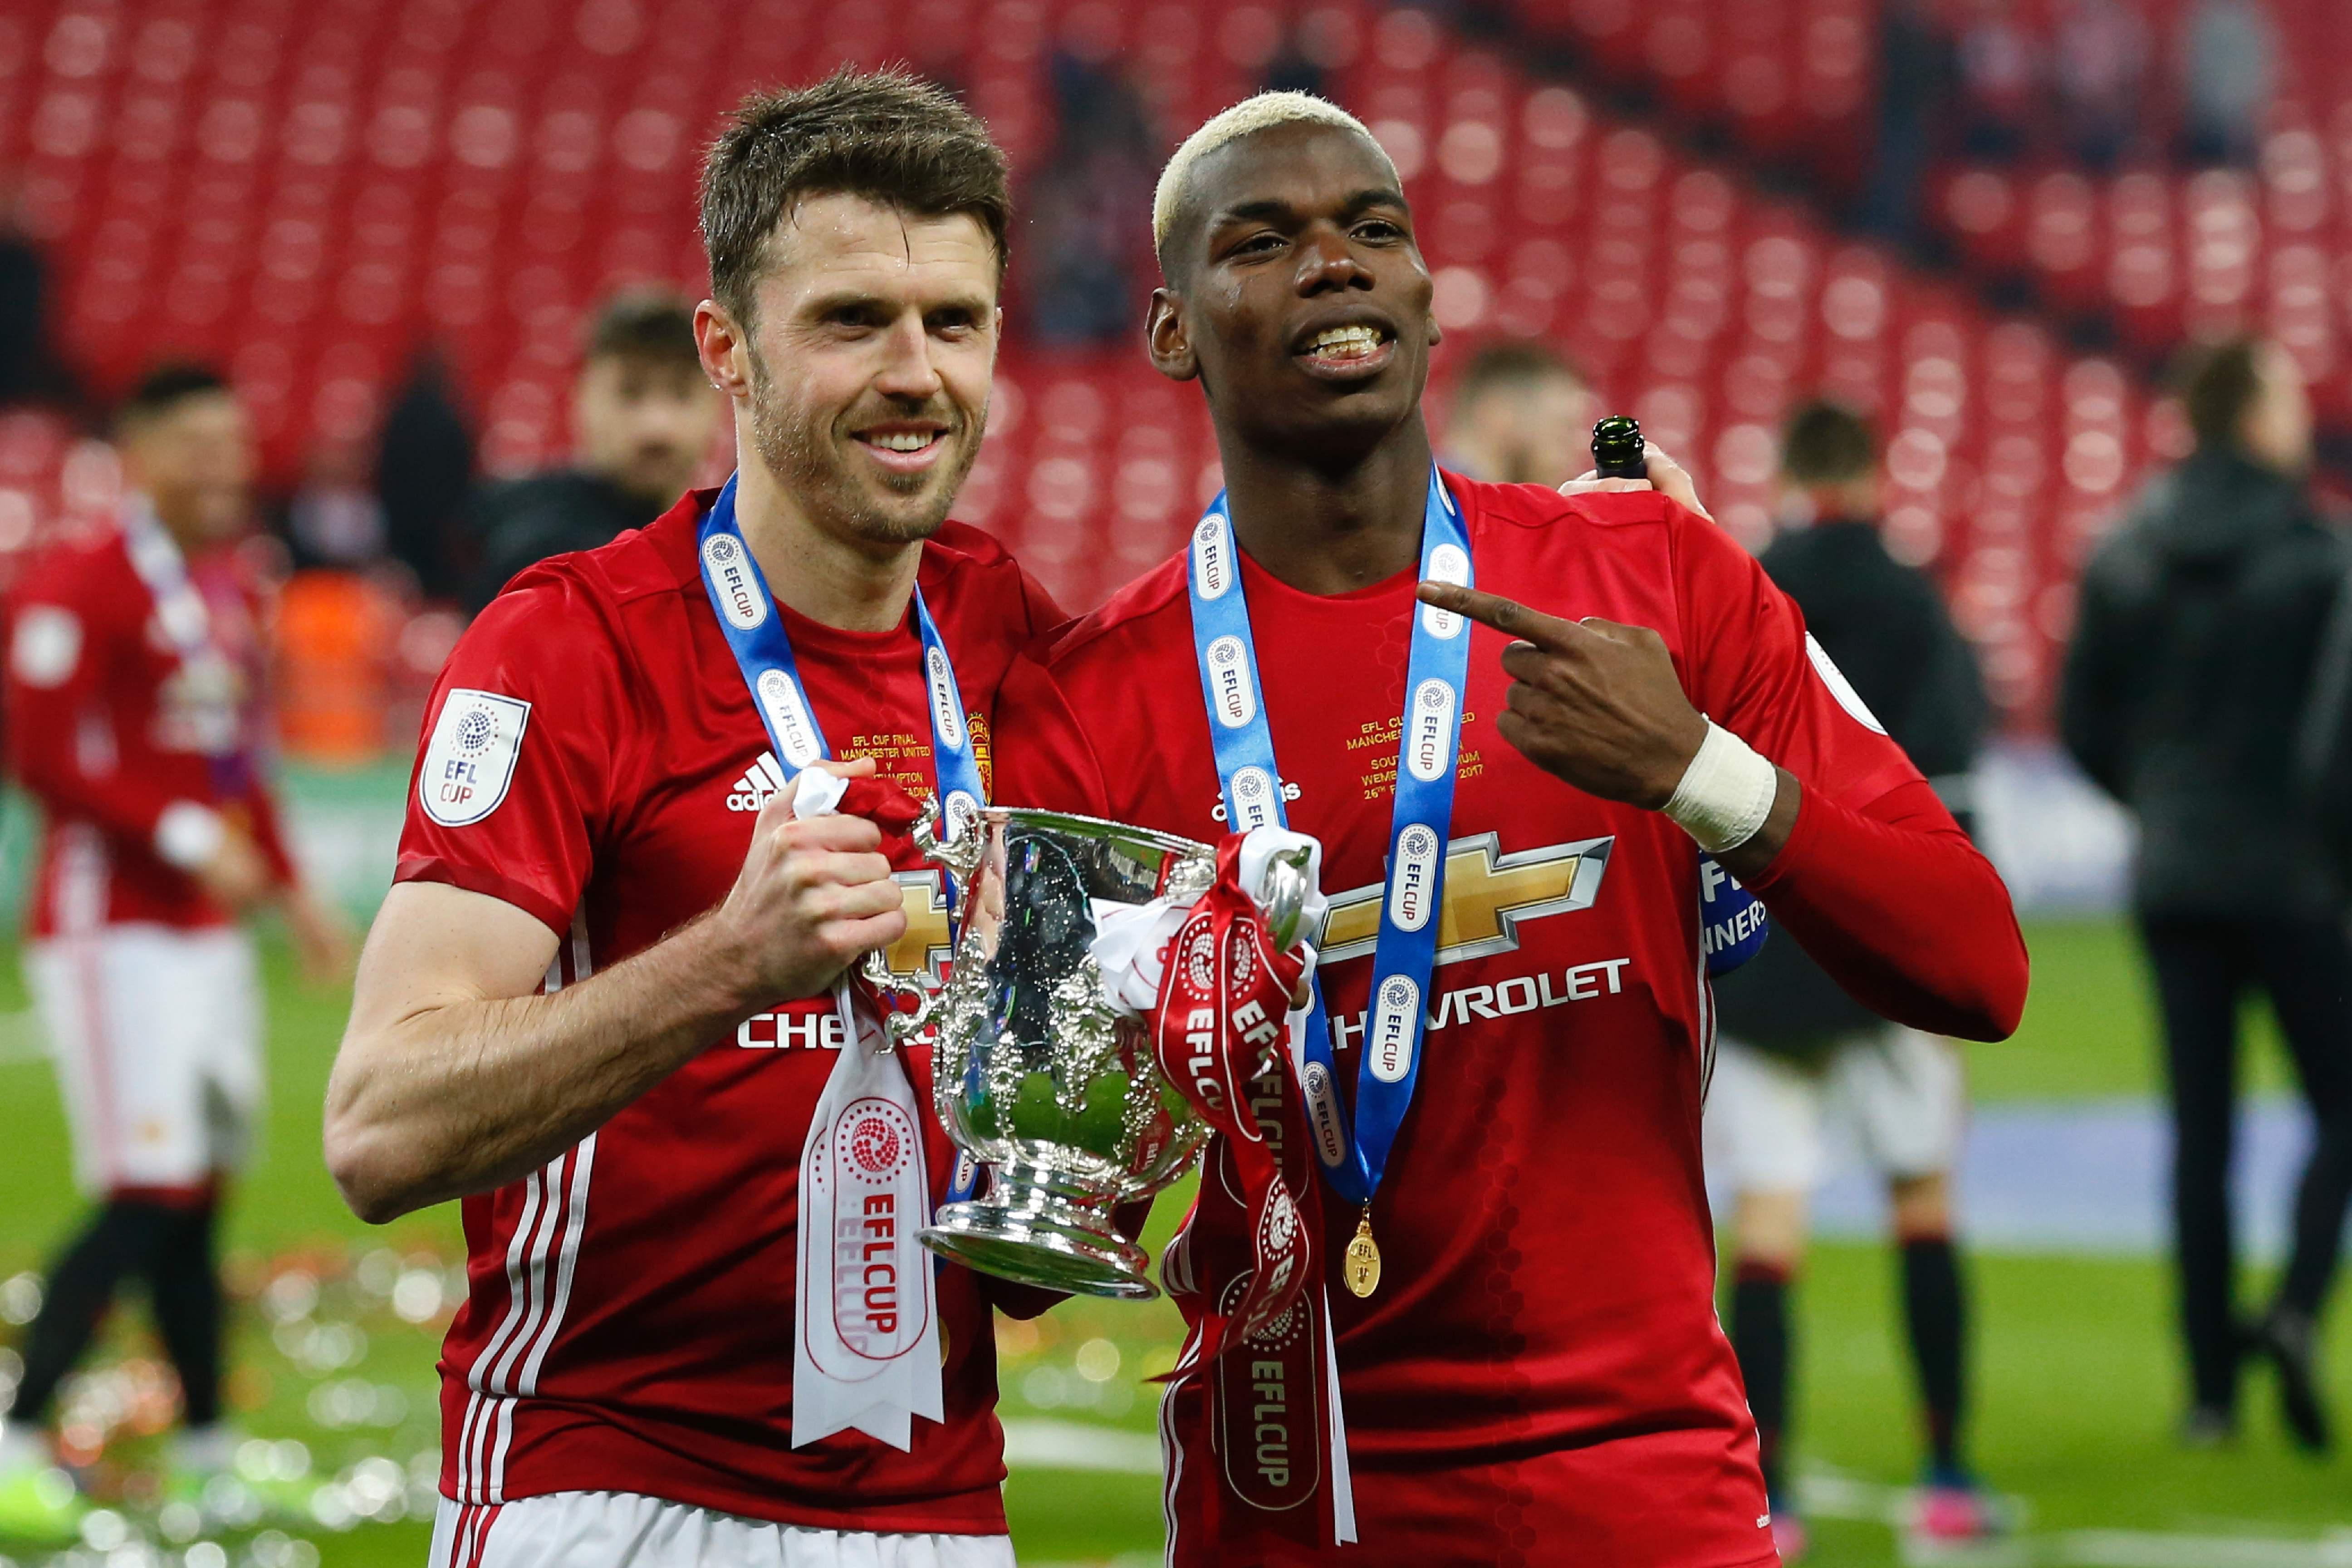 Pogba and Carrick celebrate winning the EFL Cup last season